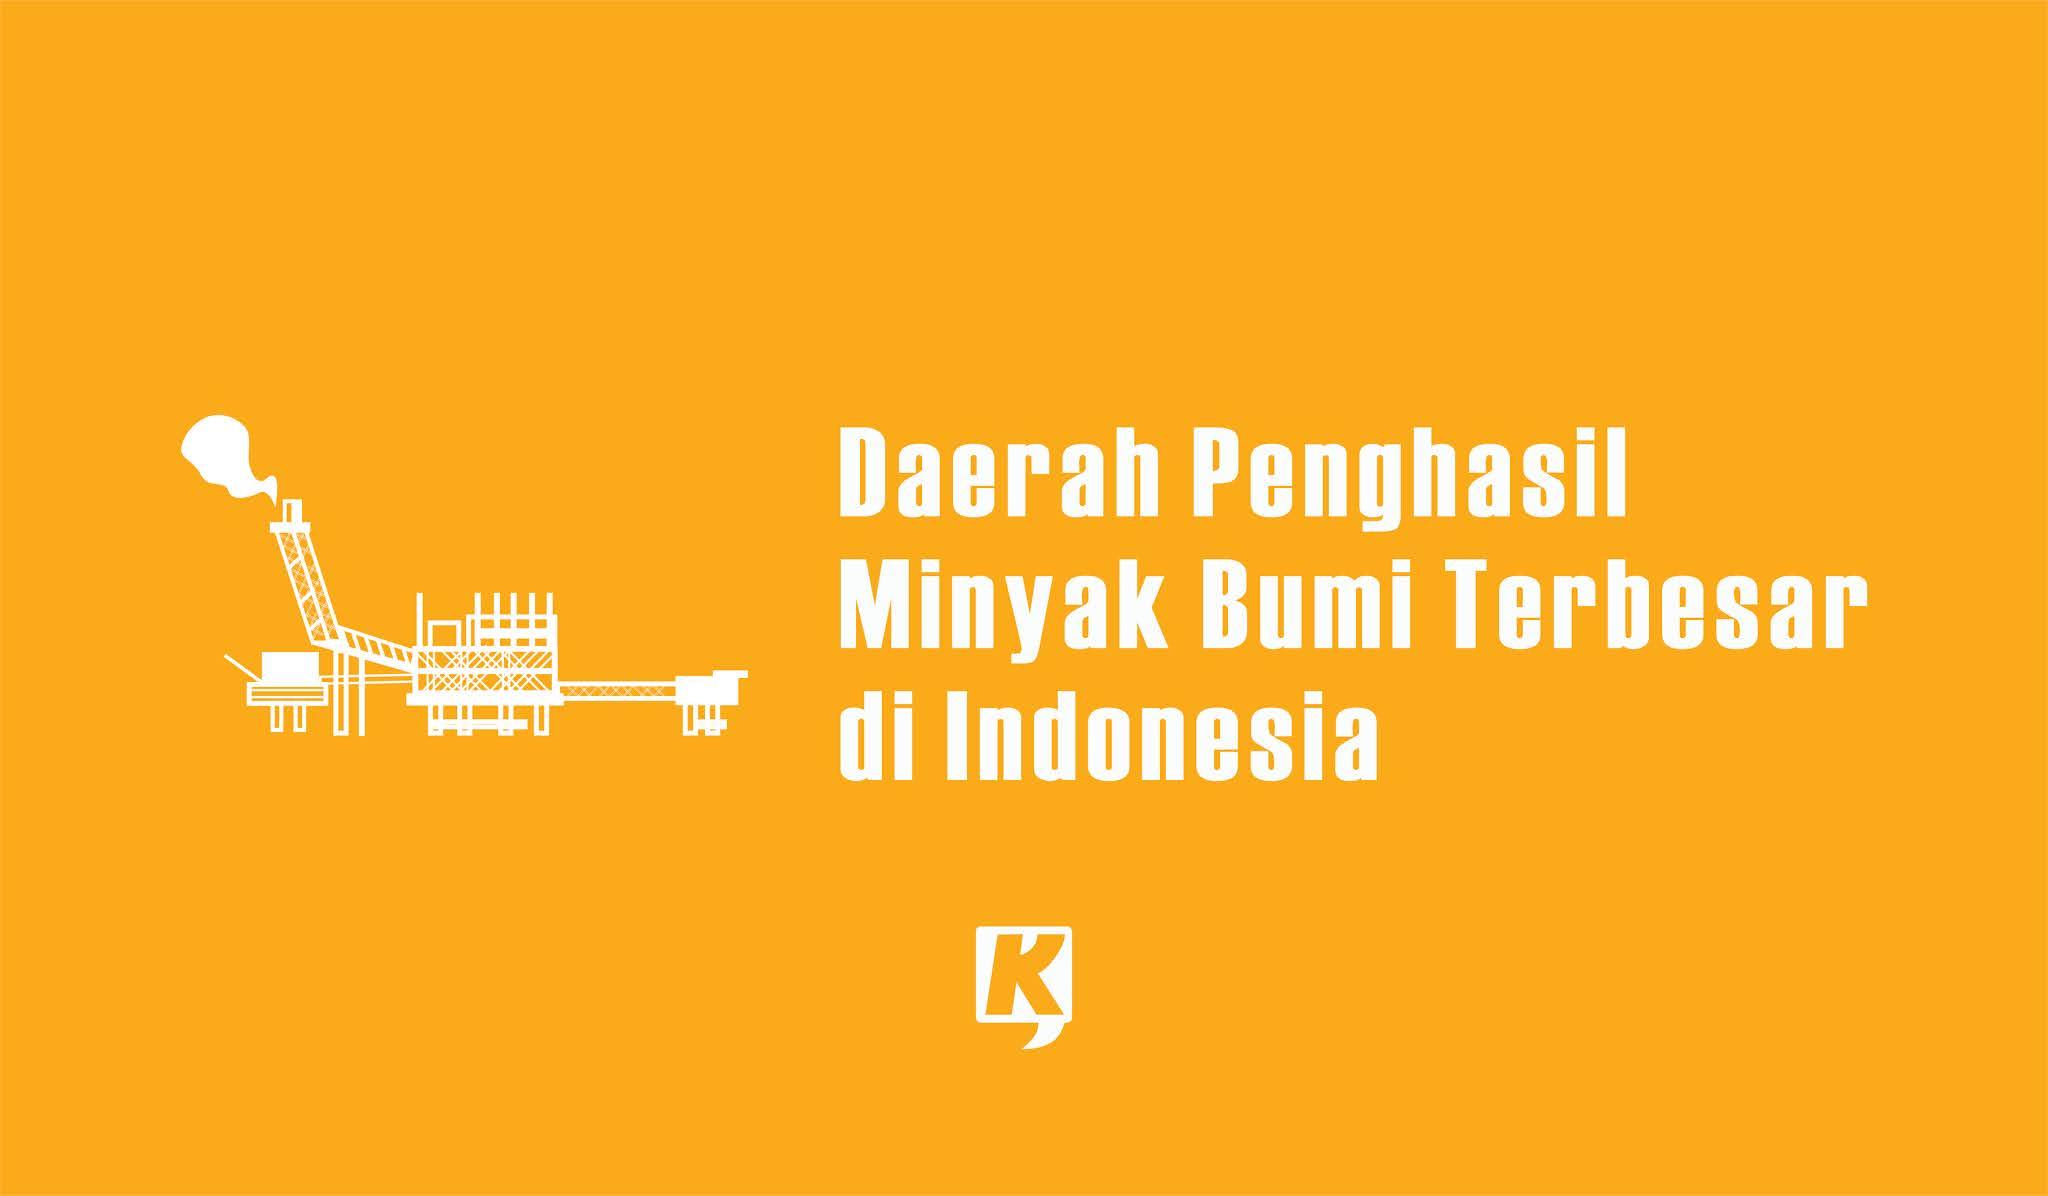 Sebutkan 5+ Daerah Penghasil Minyak Bumi Terbesar di Indonesia yang Terkenal